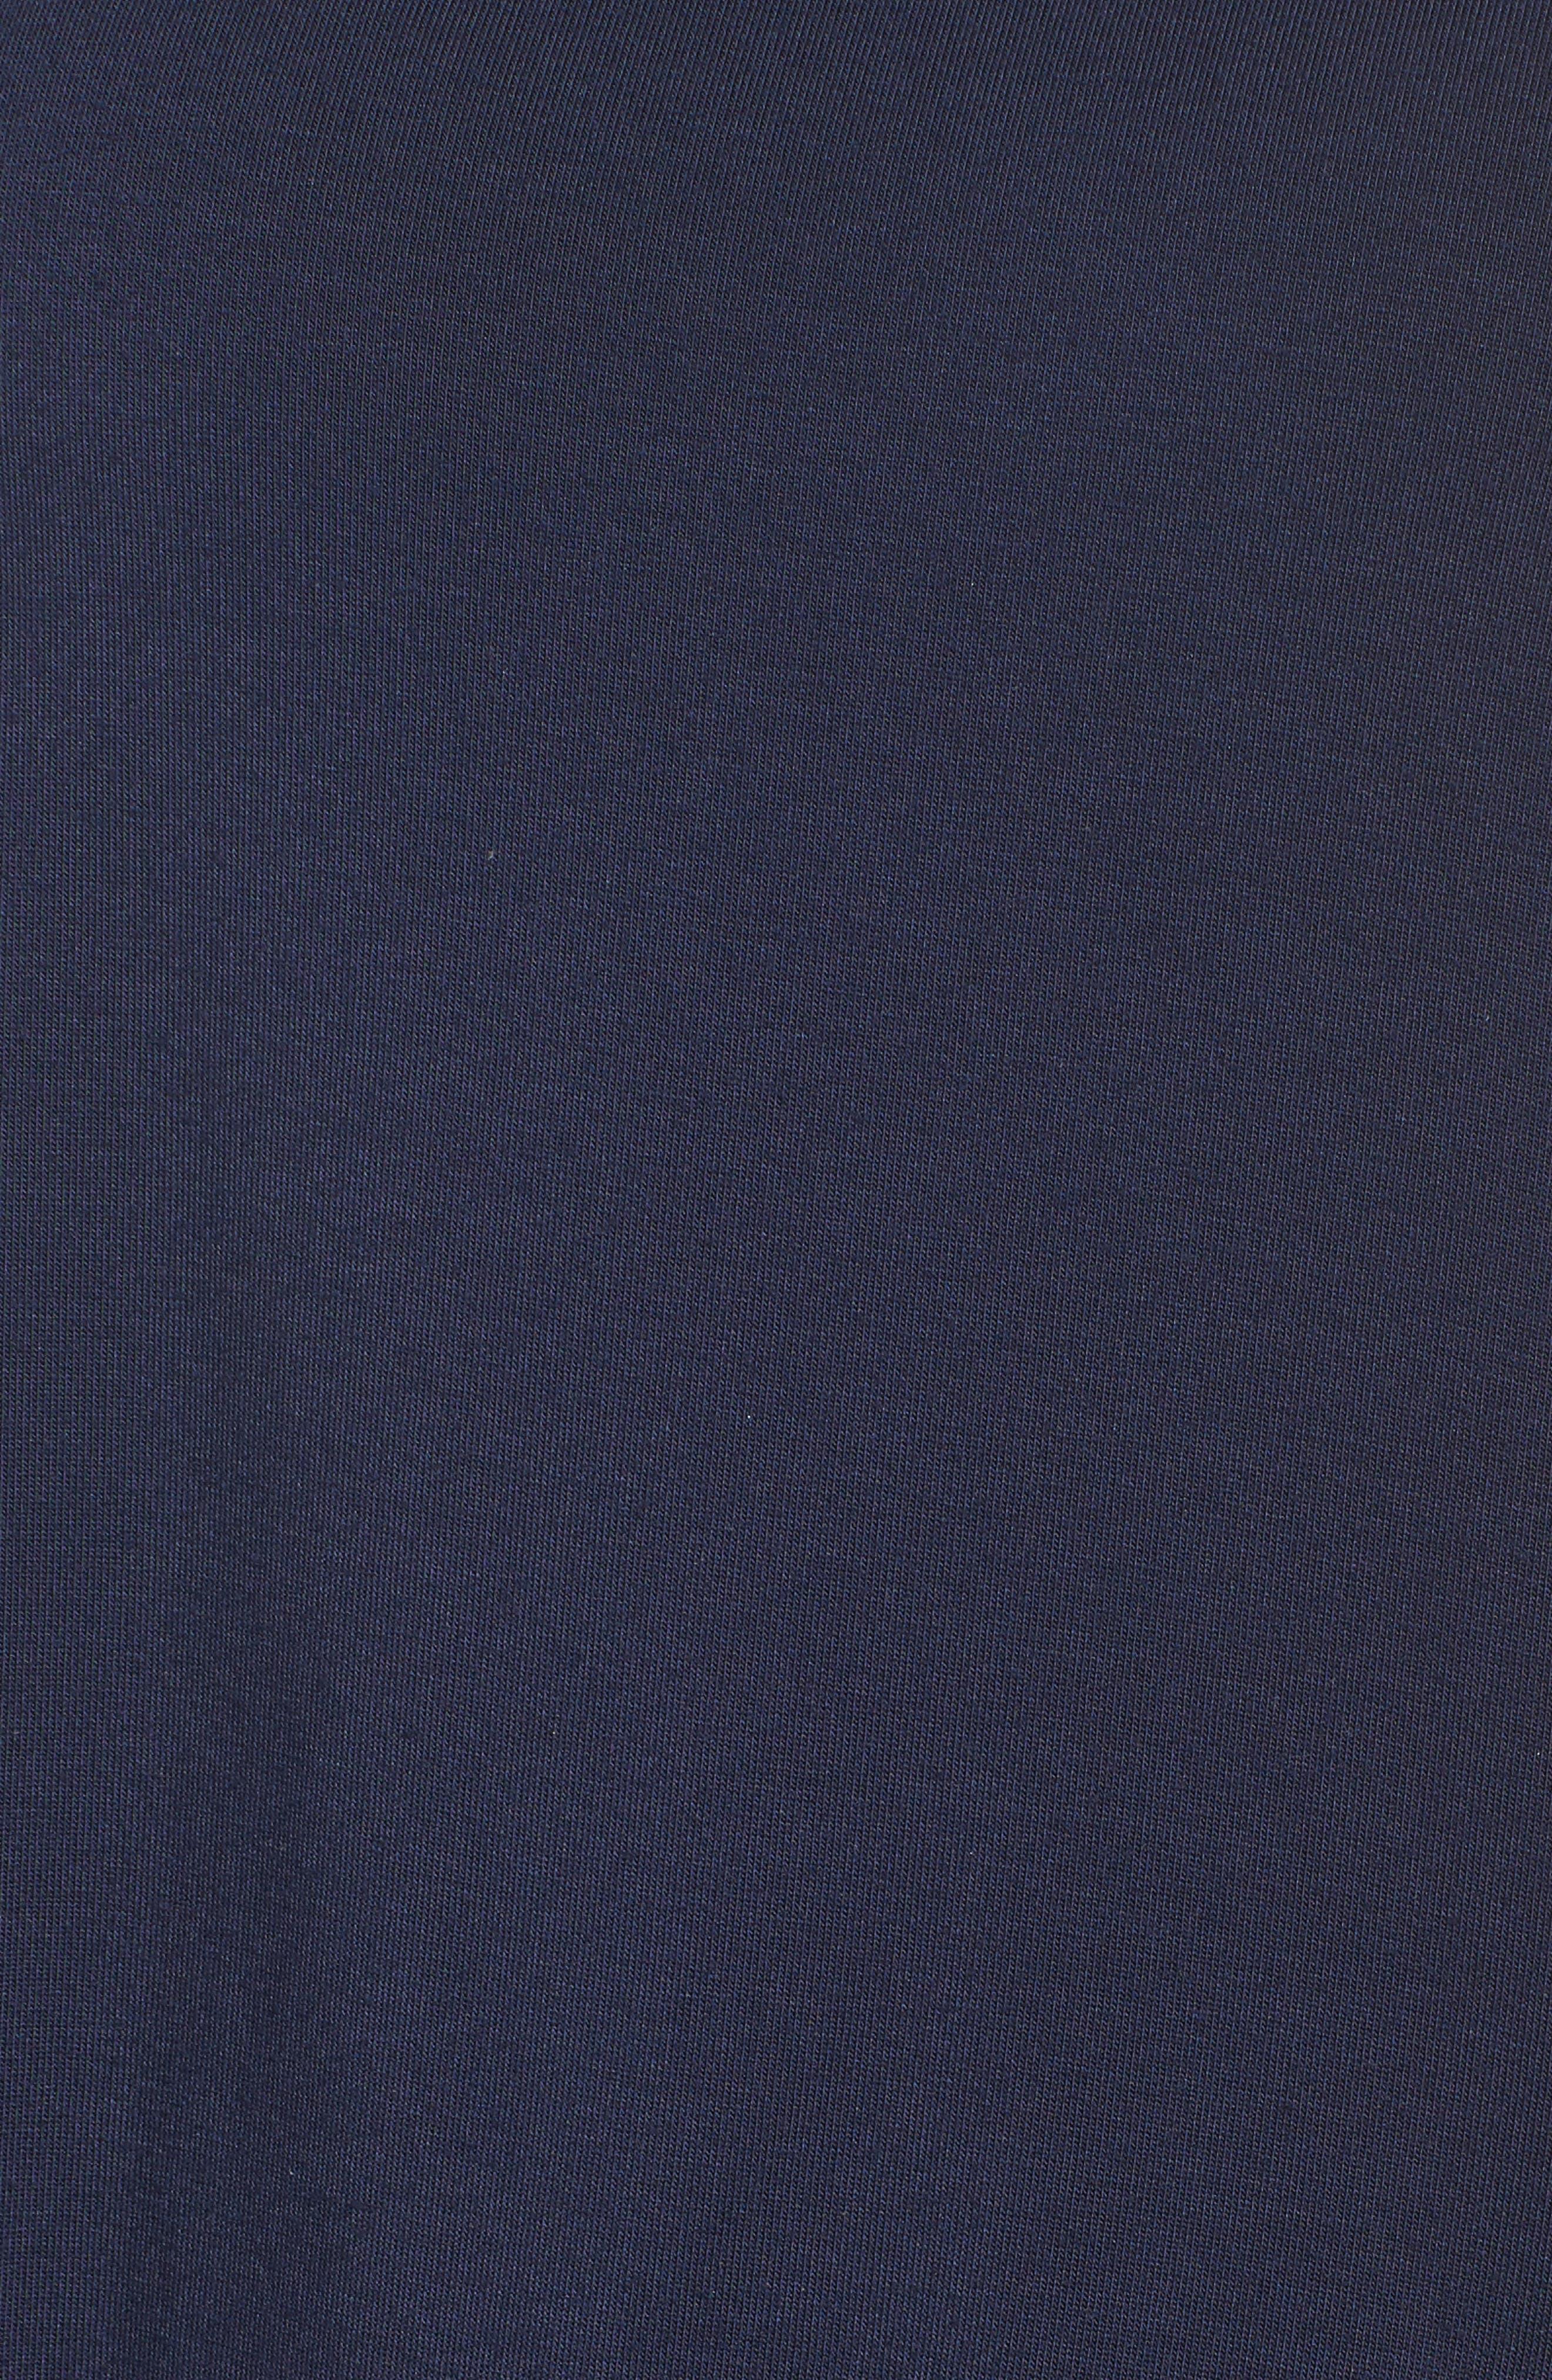 Amber Long Sleeve Top,                             Alternate thumbnail 5, color,